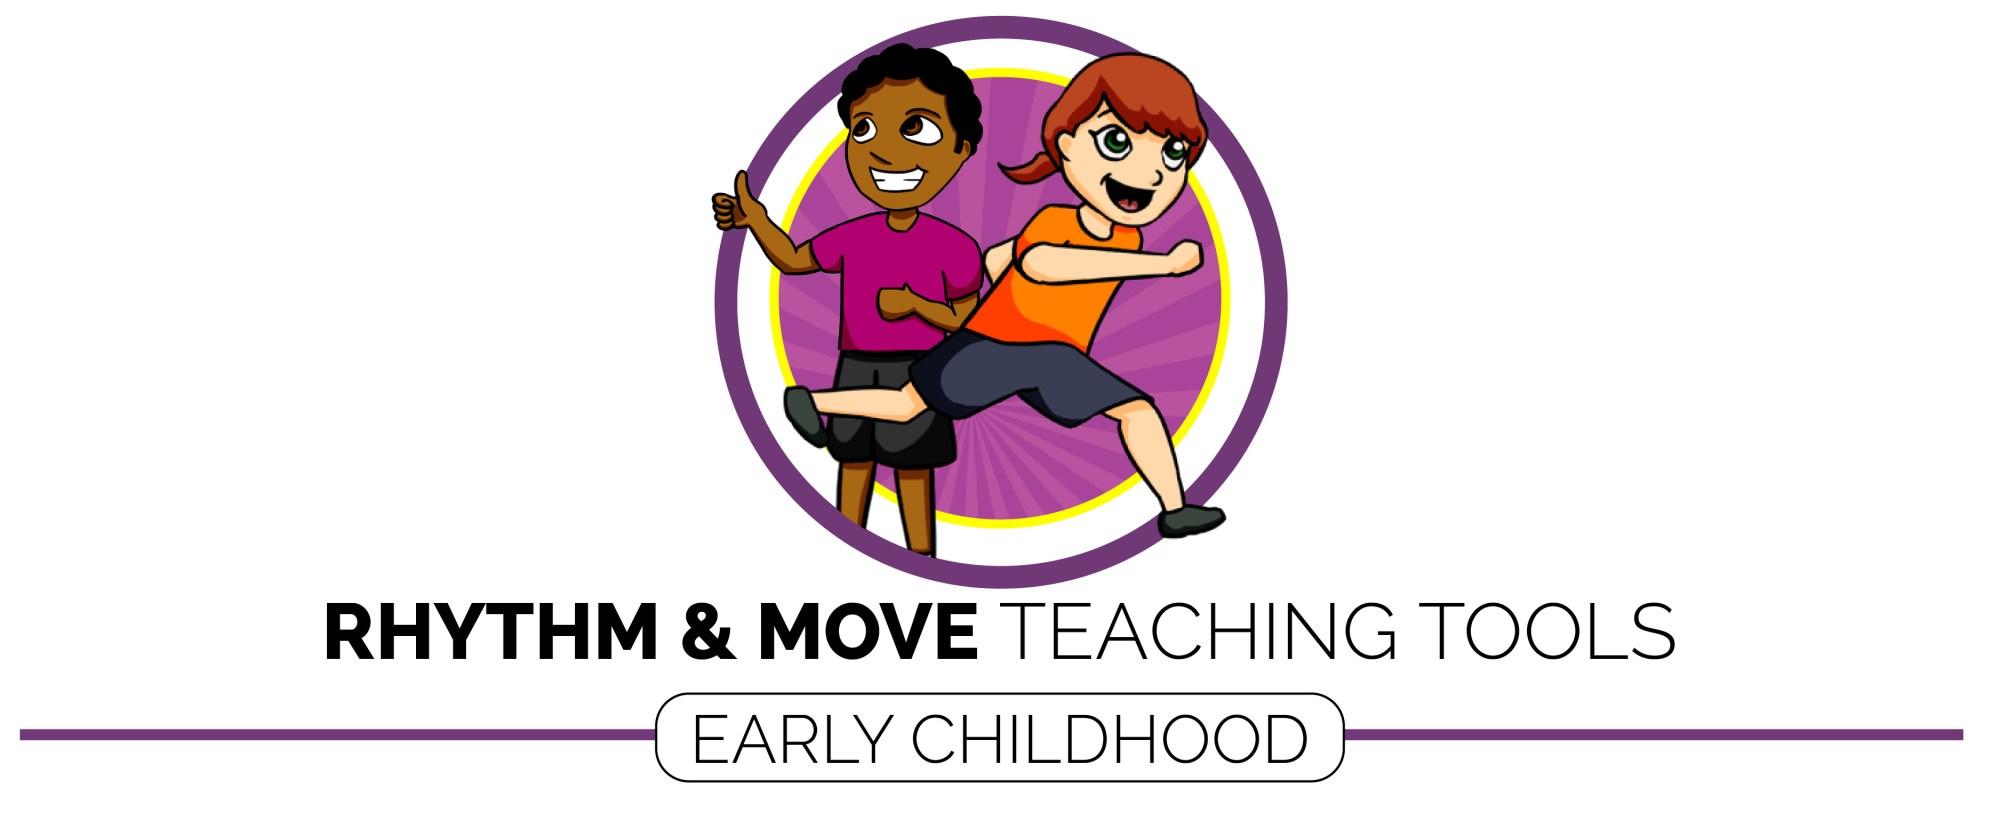 hight resolution of Rhythm \u0026 Move - OPEN Physical Education Curriculum